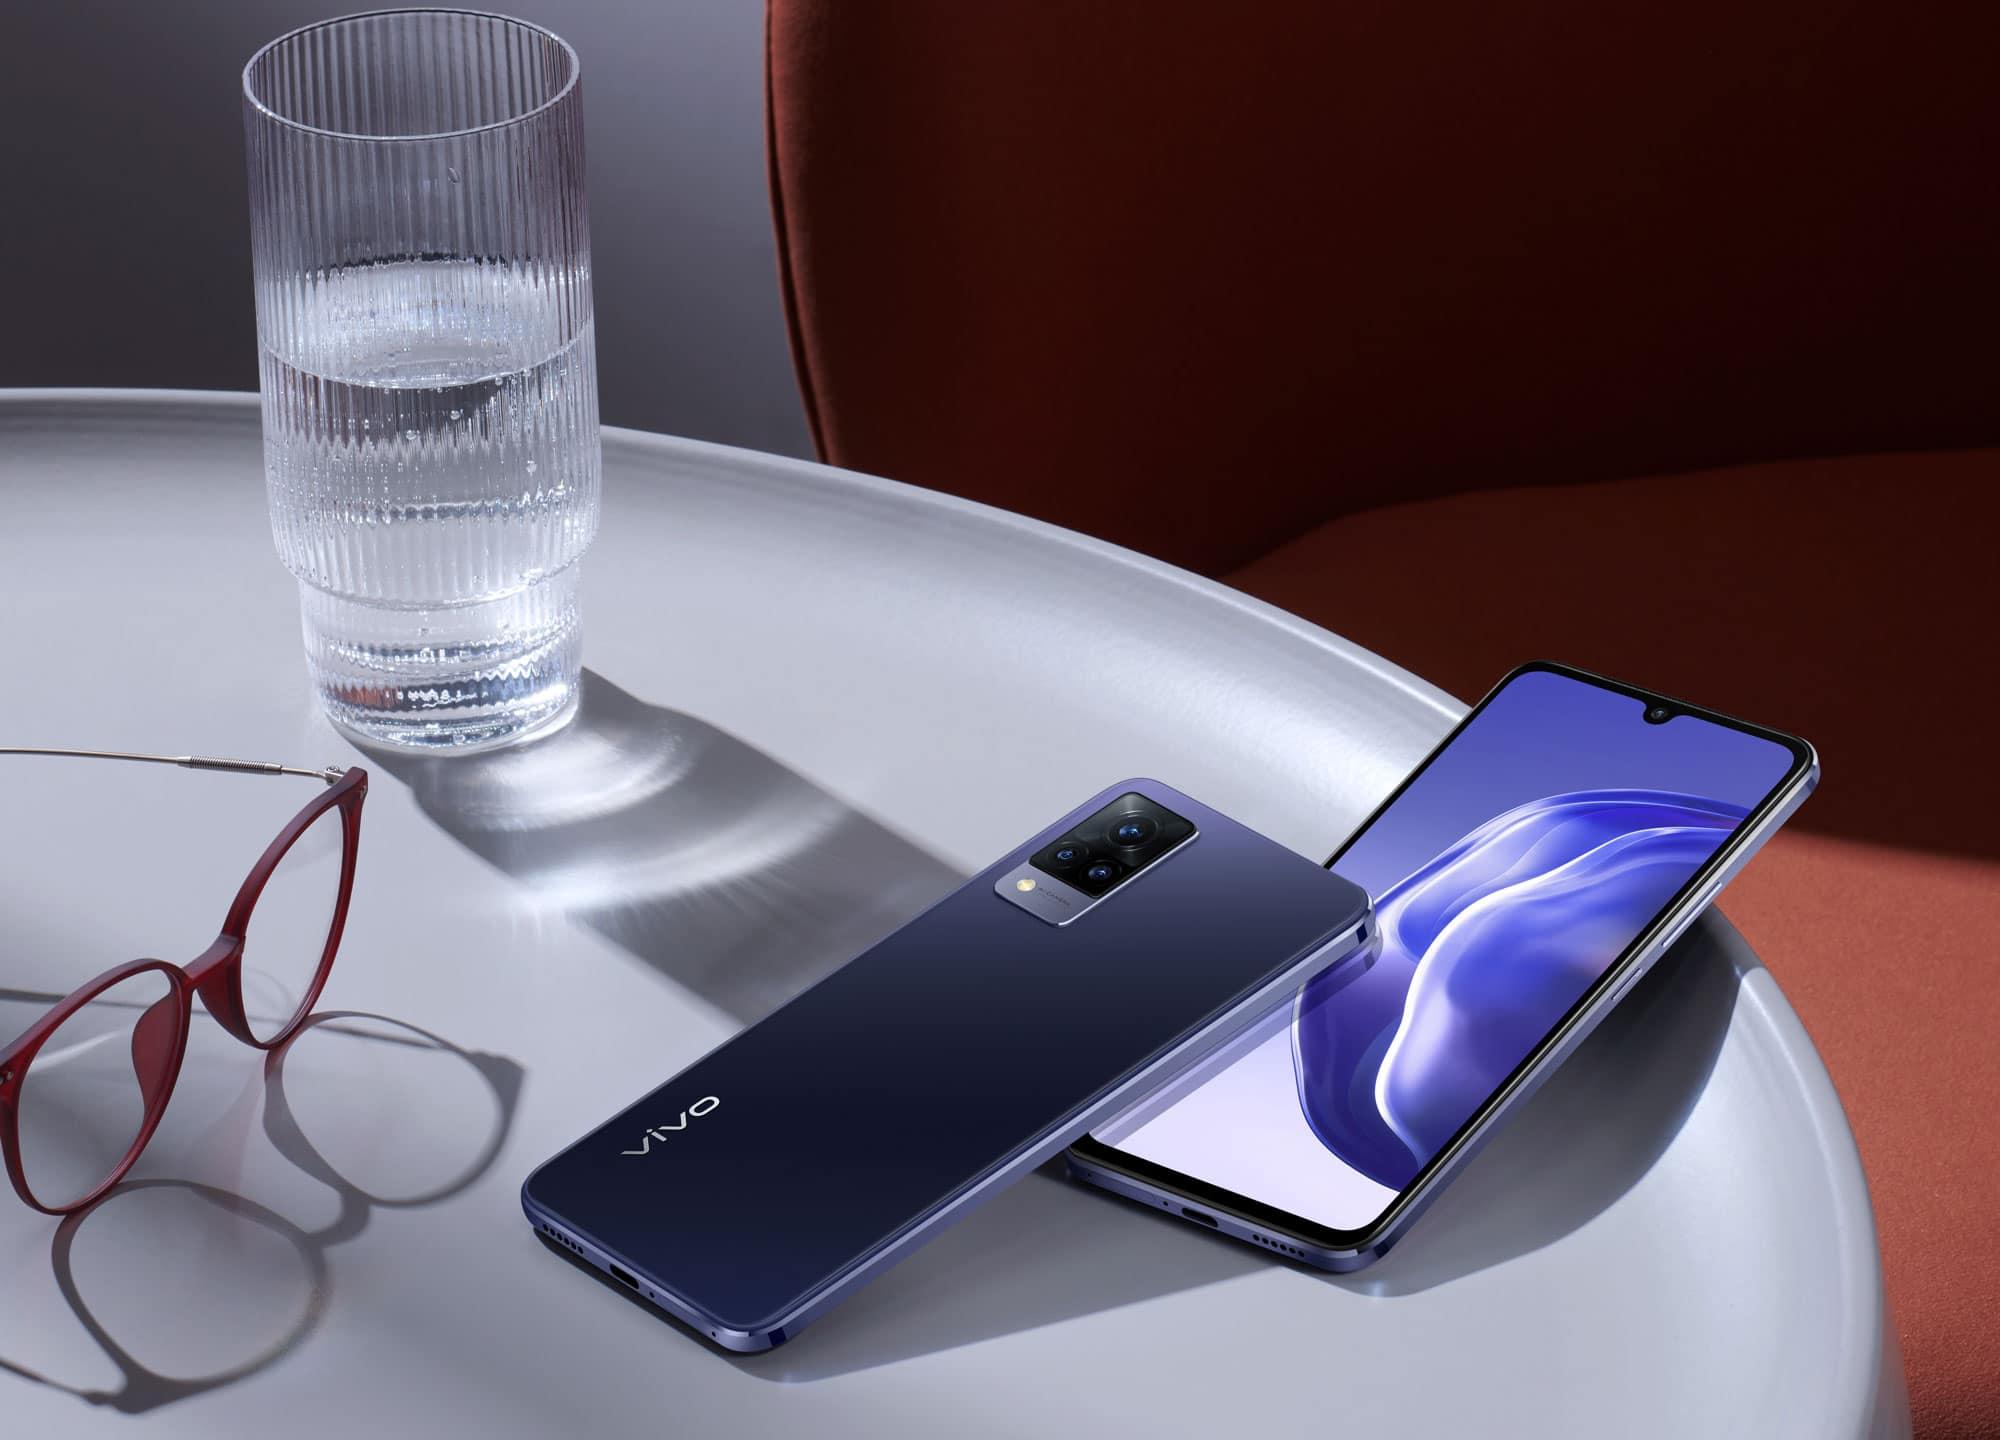 2021 vivo Smartphones Recommendation